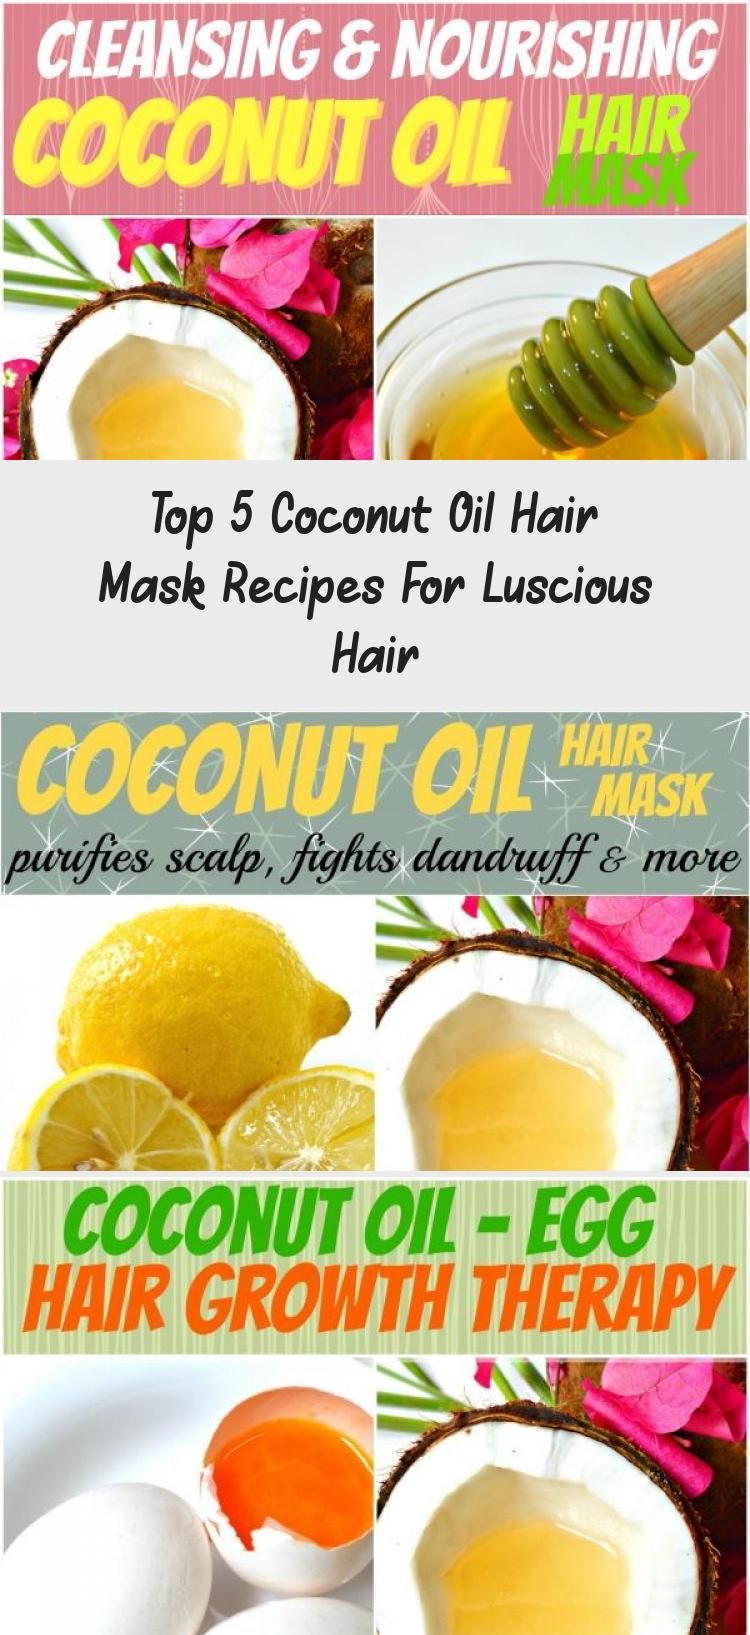 Top 5 Coconut Oil Hair Mask Recipes For Luscious Hair #fasterhairgrowth